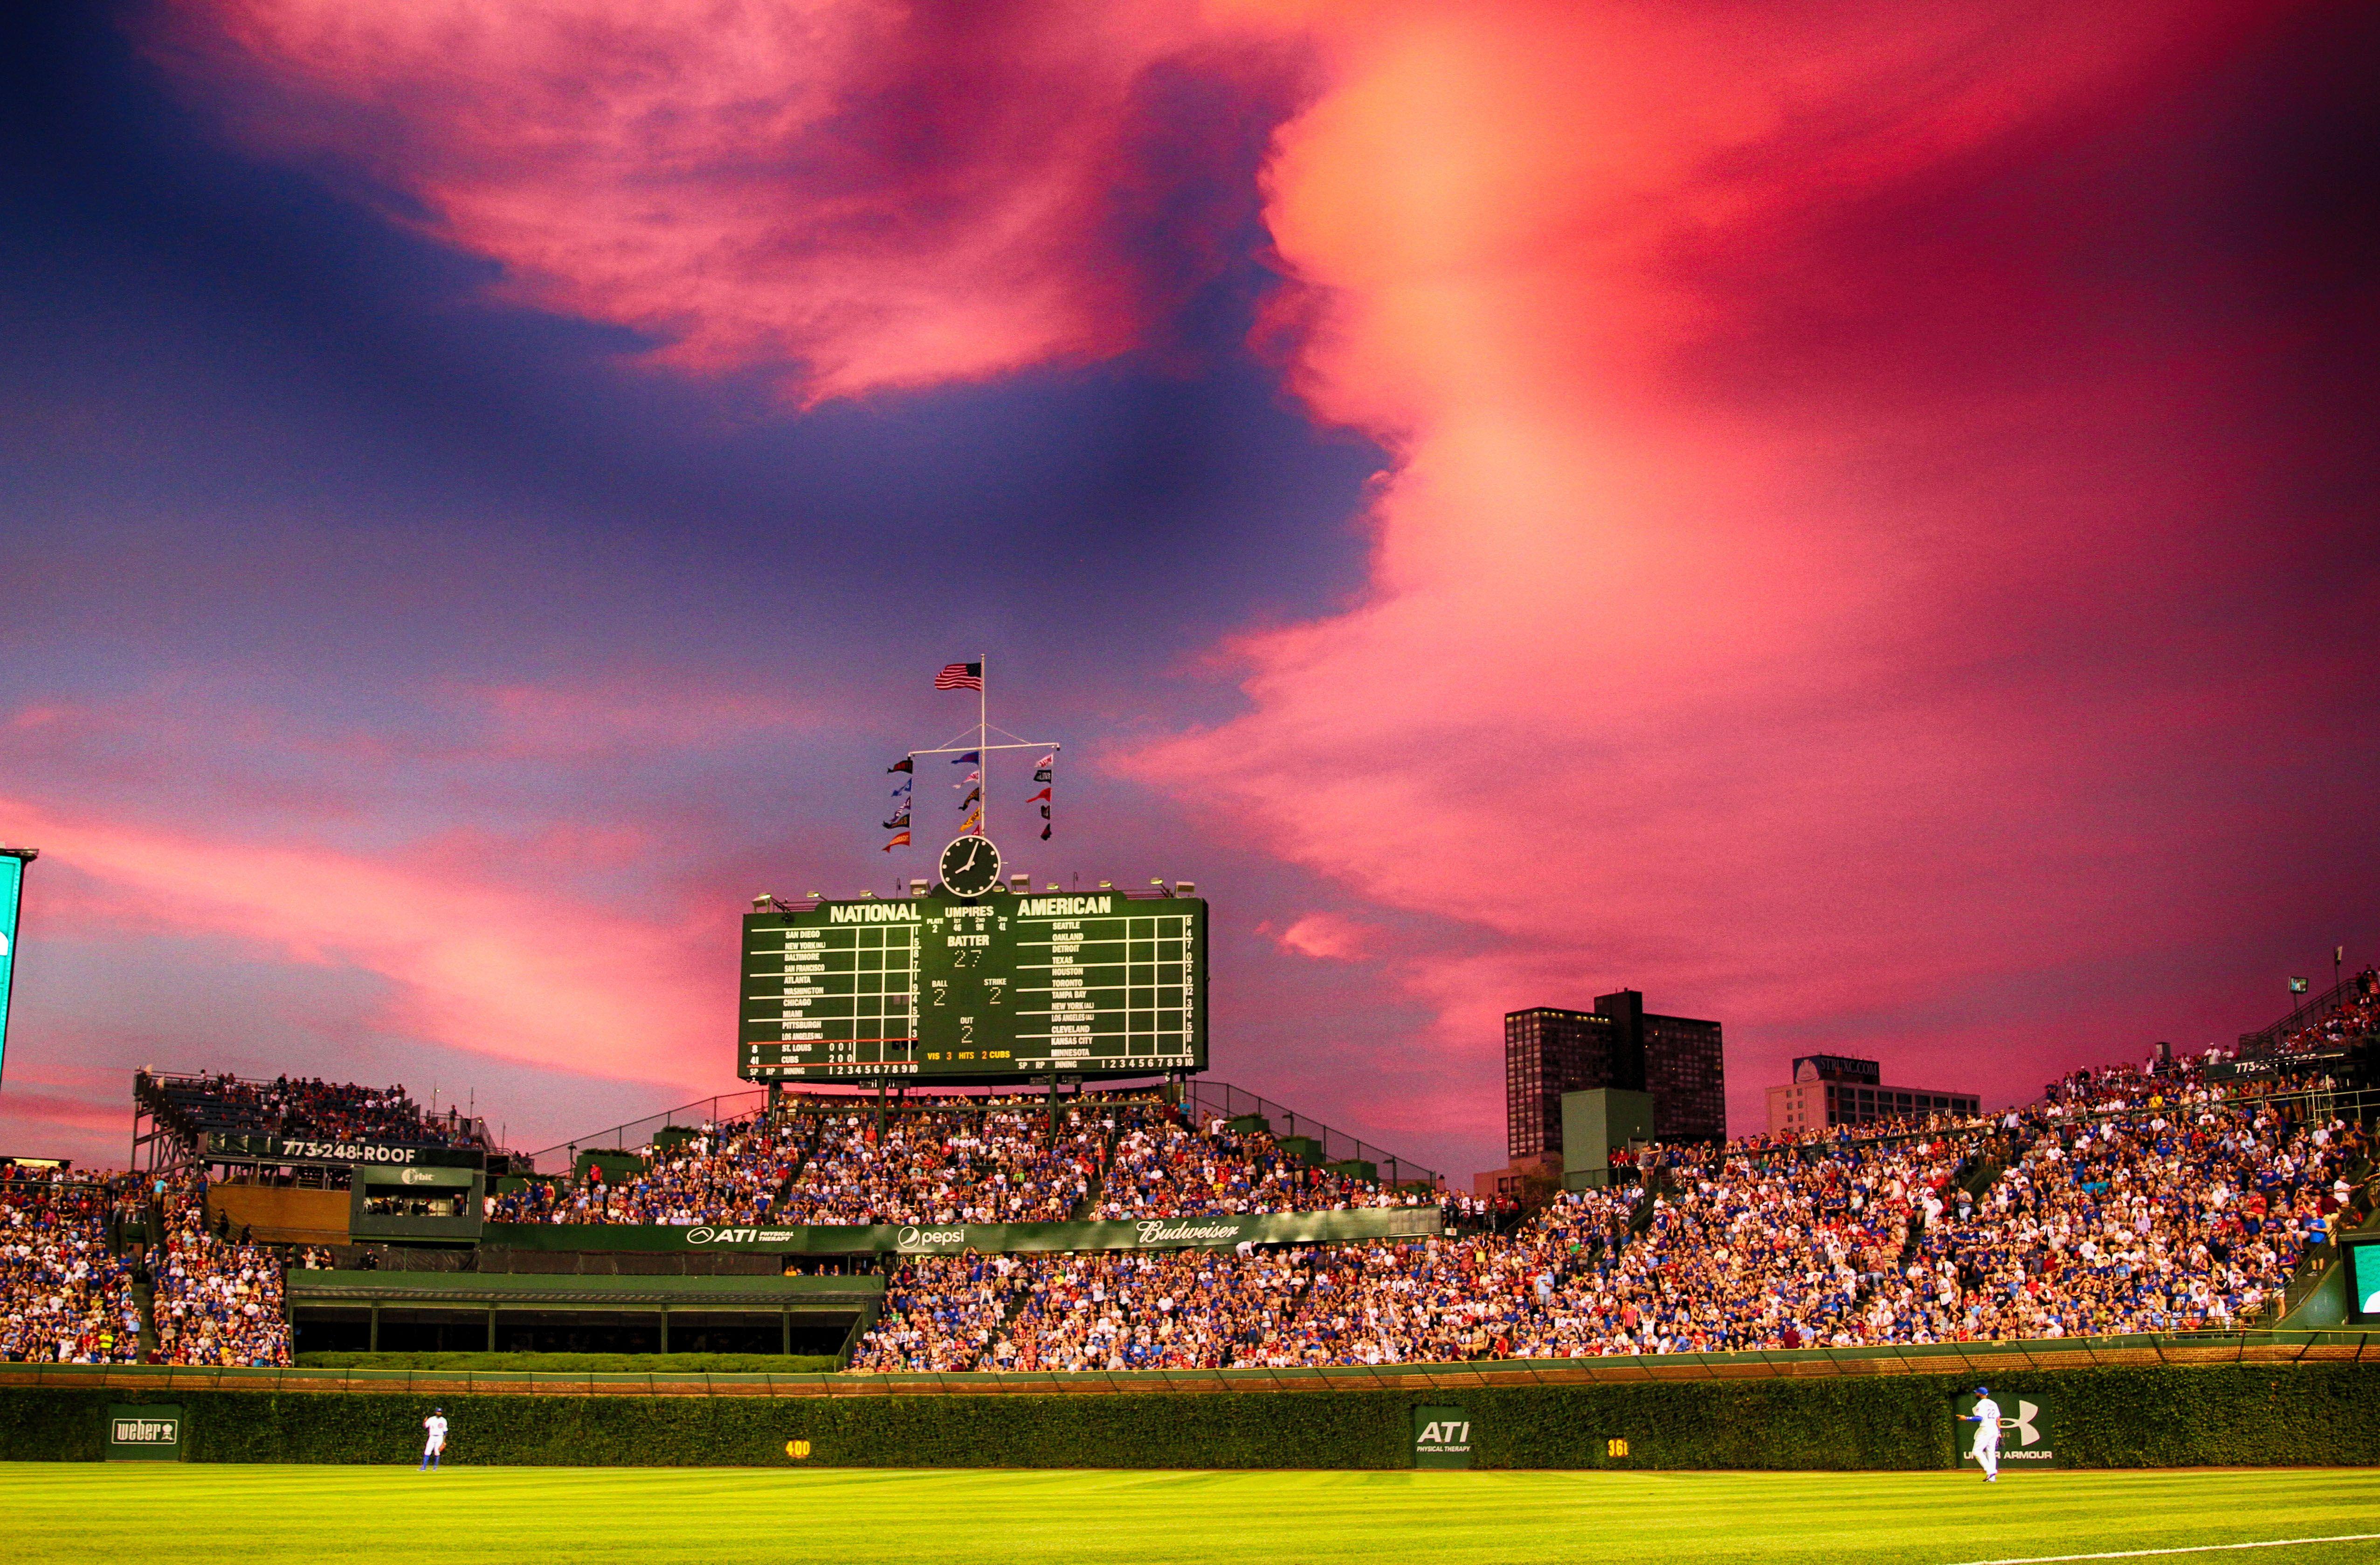 Mlb Power Rankings Top 30 Stadiums Of All Time Mlb Stadiums Best Baseball Stadiums Wrigley Field